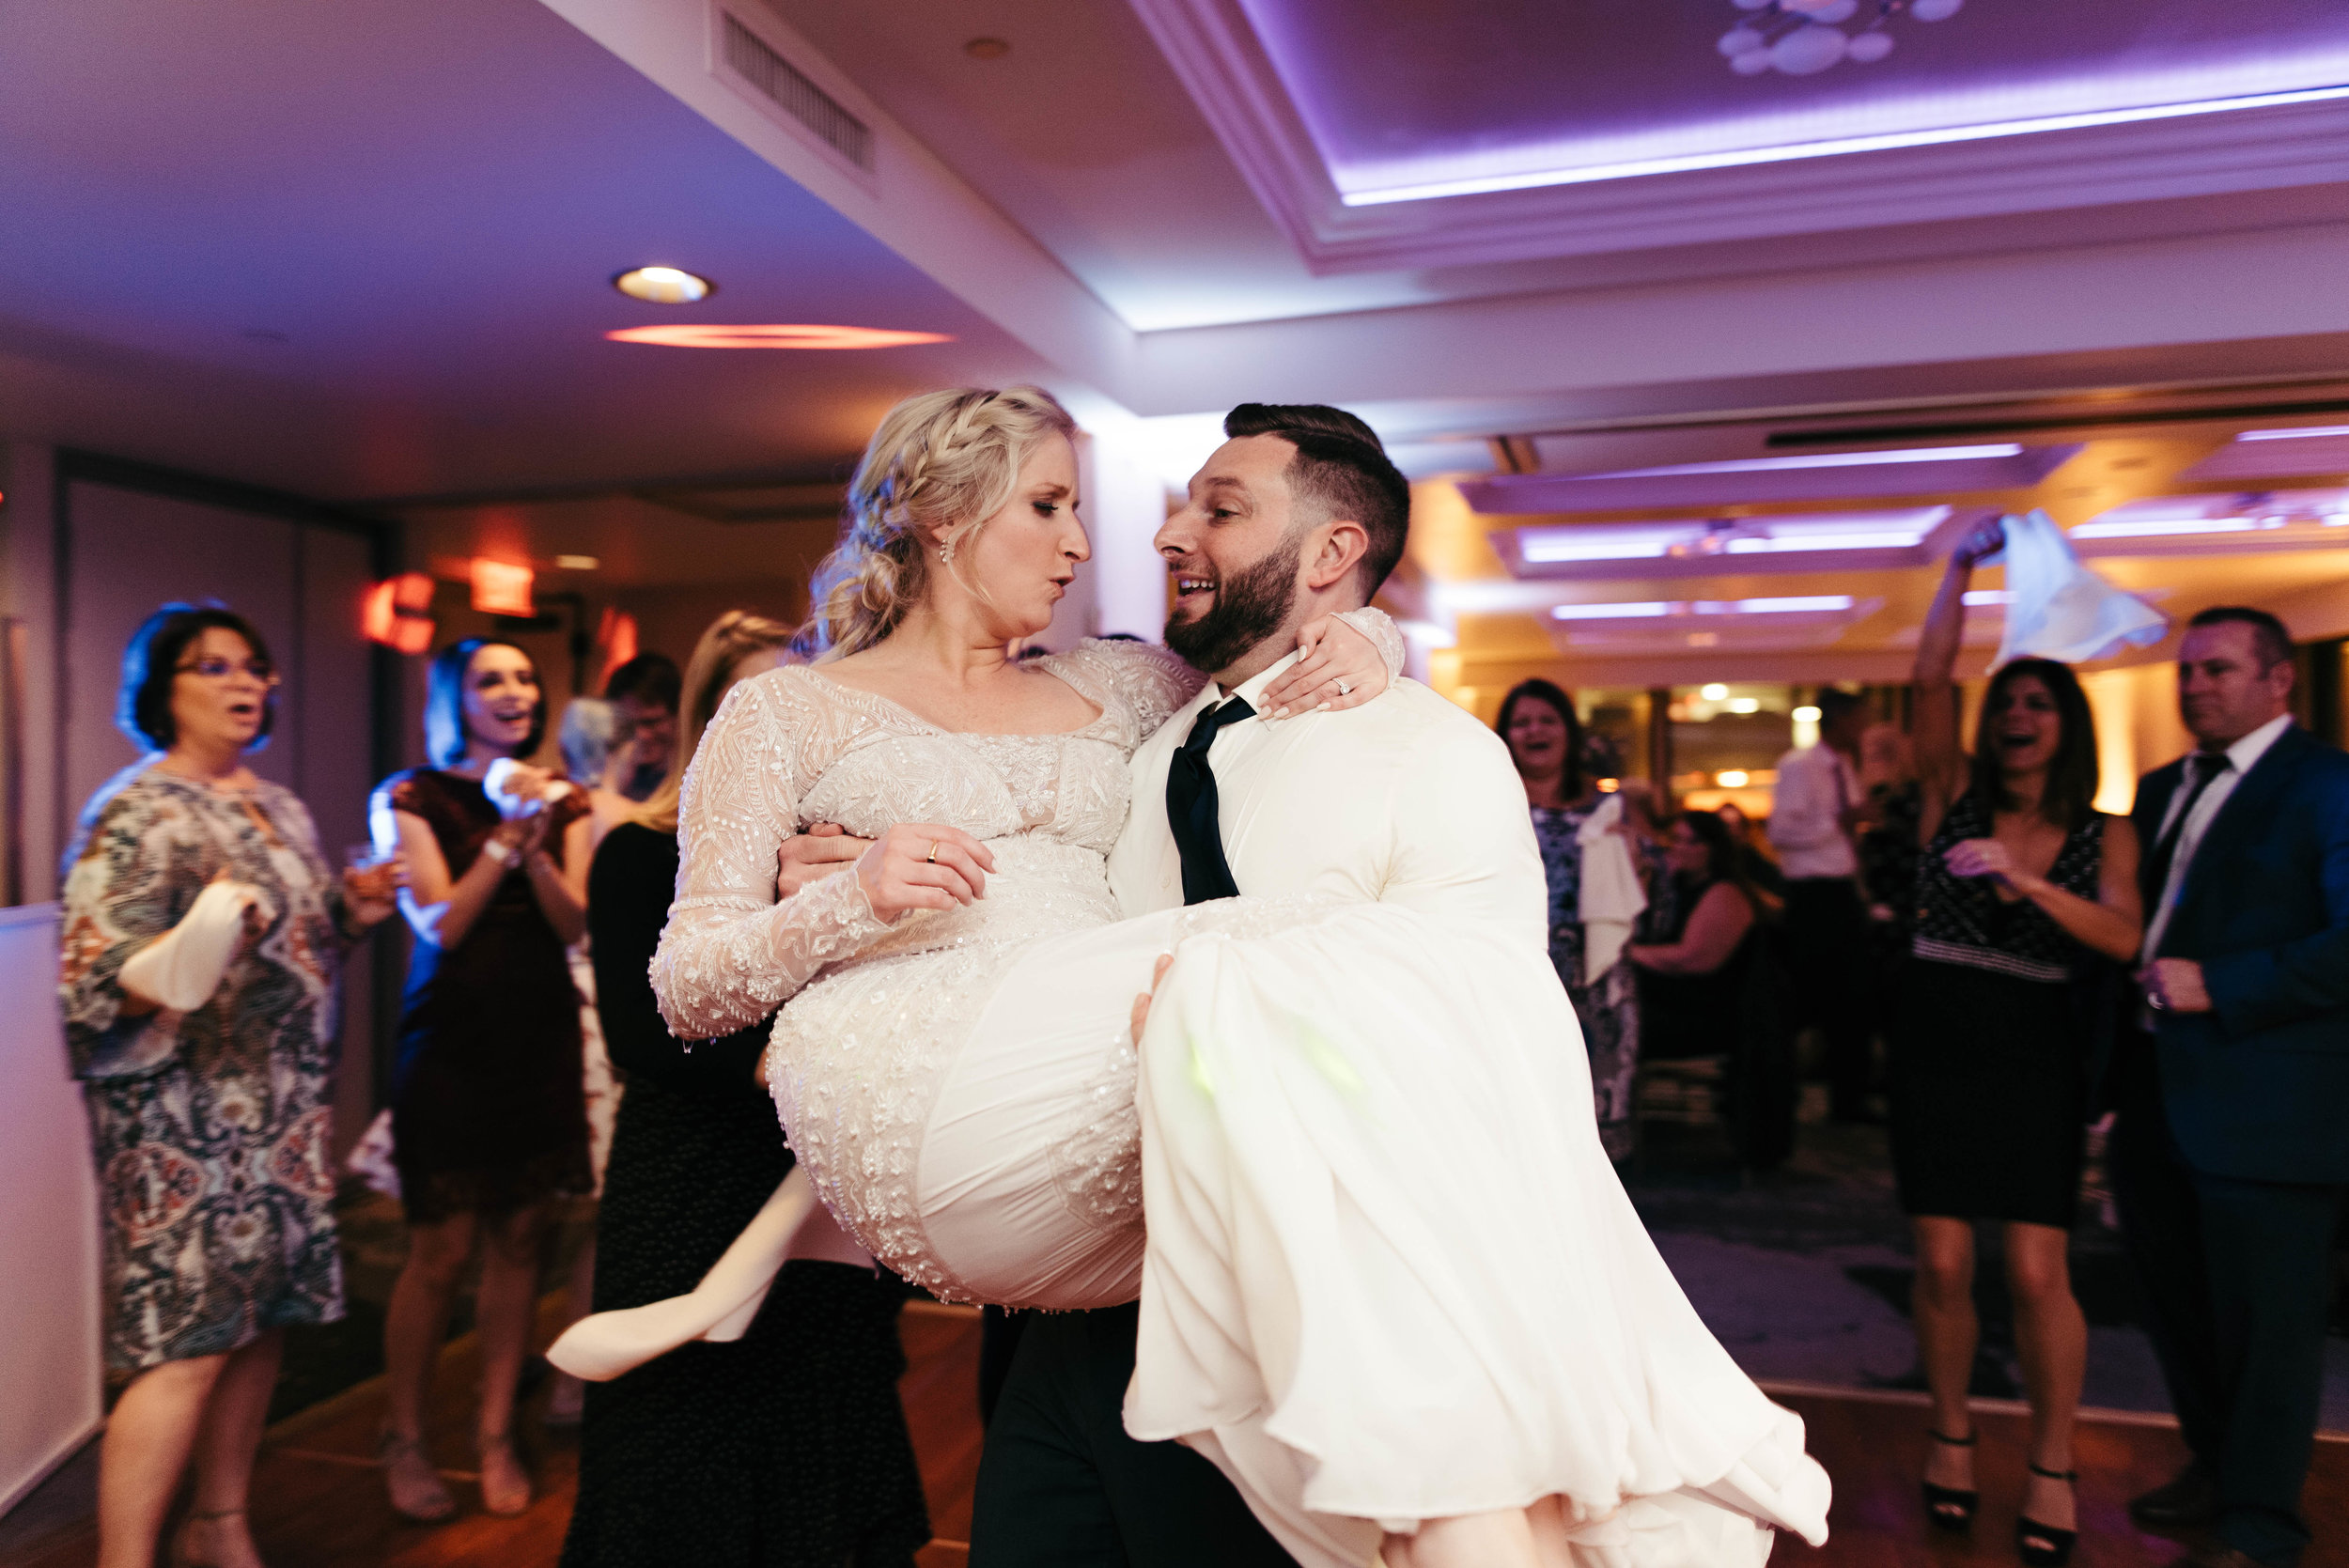 renaissance hotel wedding photos-58.jpg